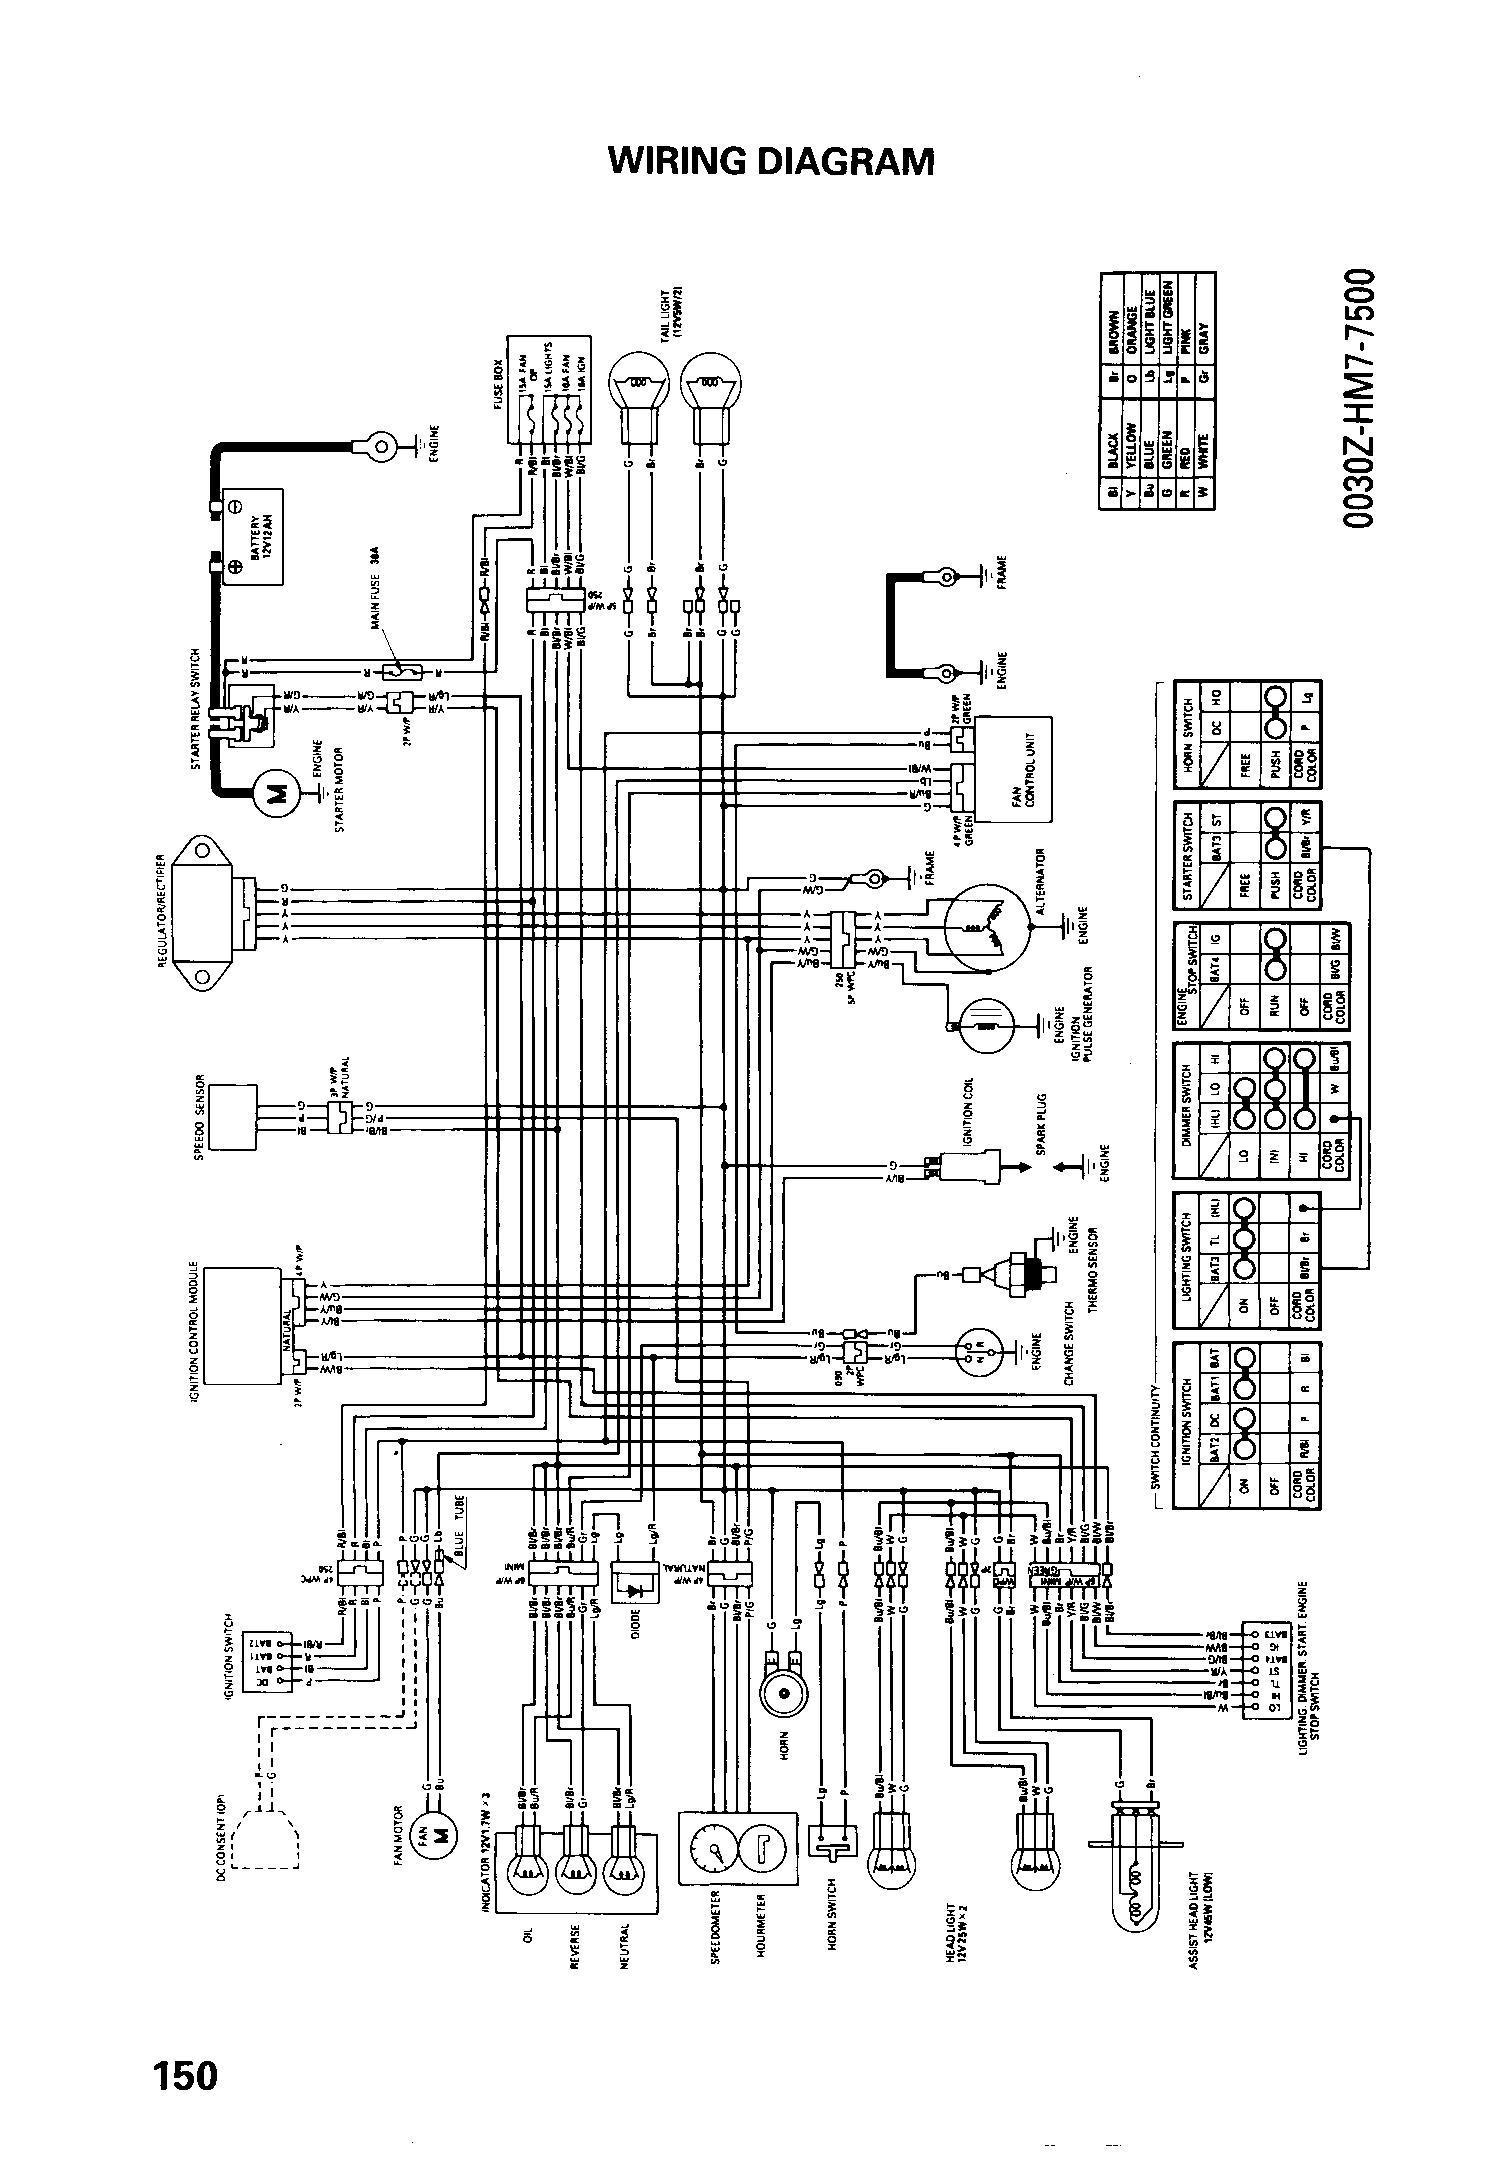 Honda Trx450er Wiring Harness - 1992 Explorer Fuse Box Layout for Wiring  Diagram Schematics | Trx 450 Wiring Diagram |  | Wiring Diagram Schematics